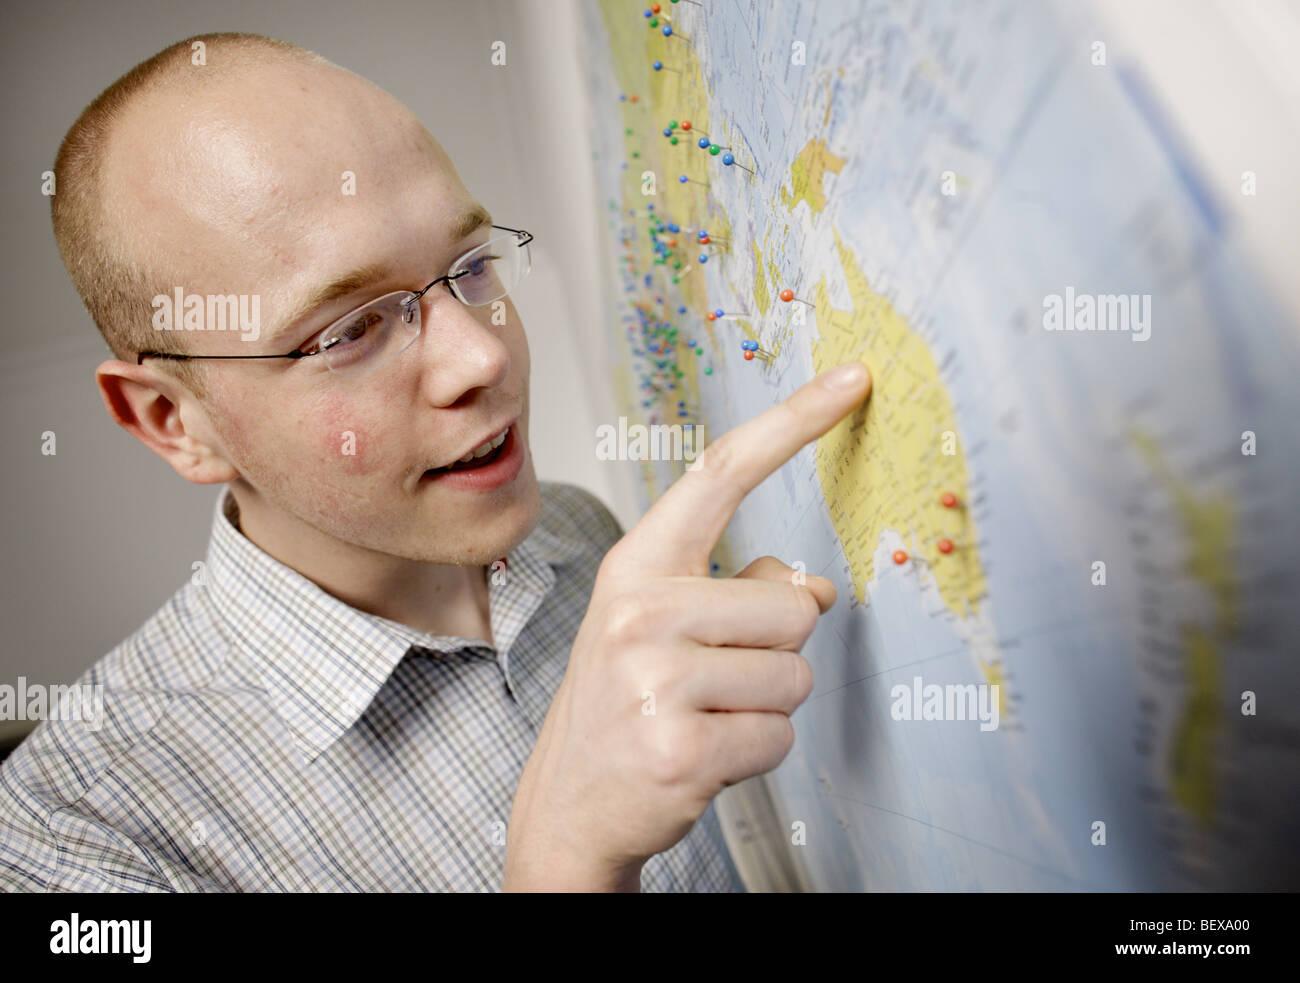 Junger Mann will nach Australien zu gehen. Stockbild